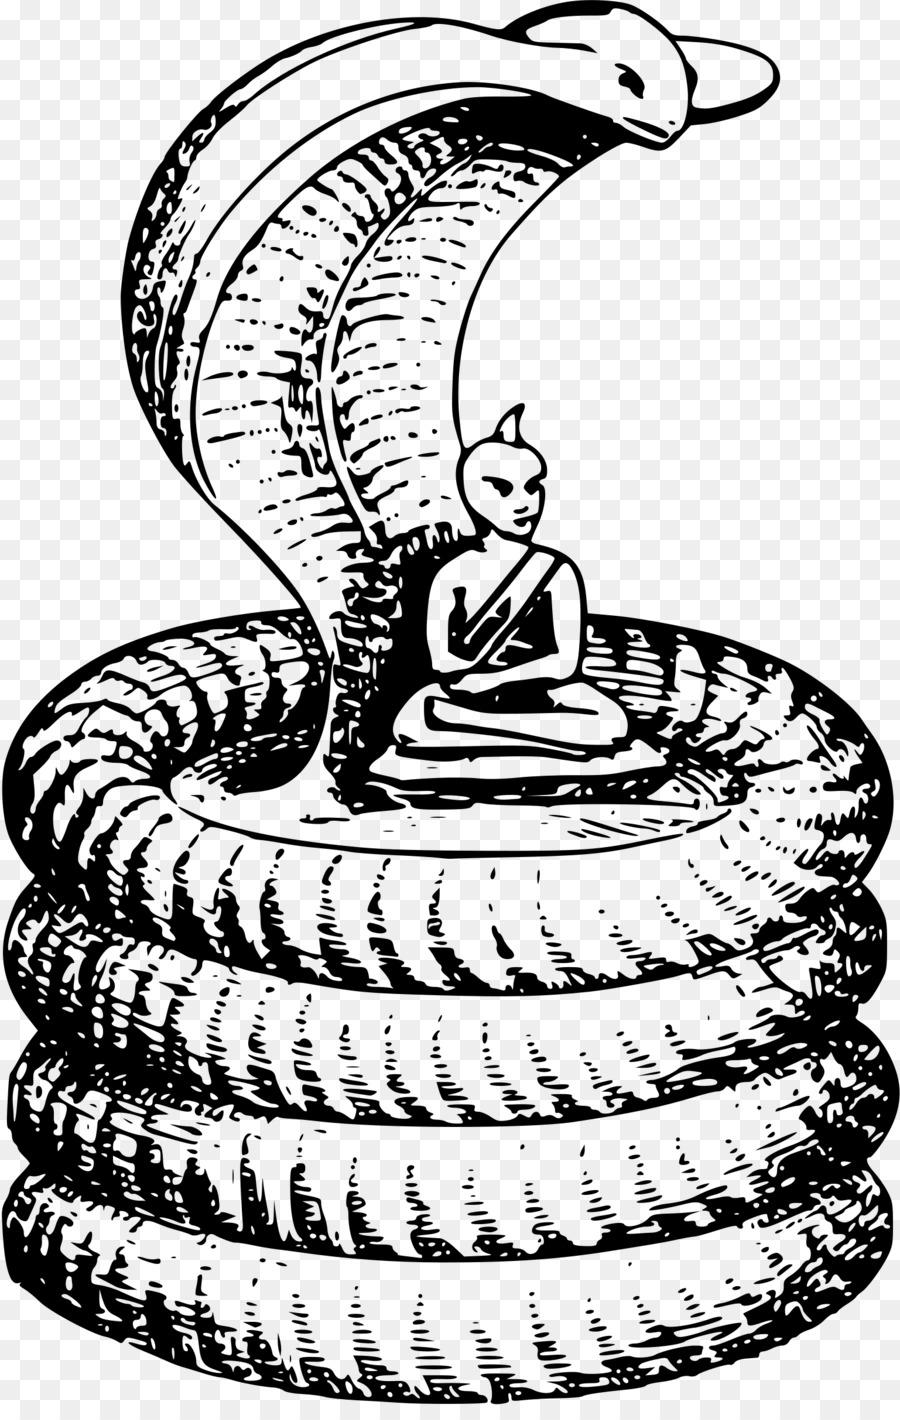 Cobra clipart. Snake buddhism clip art